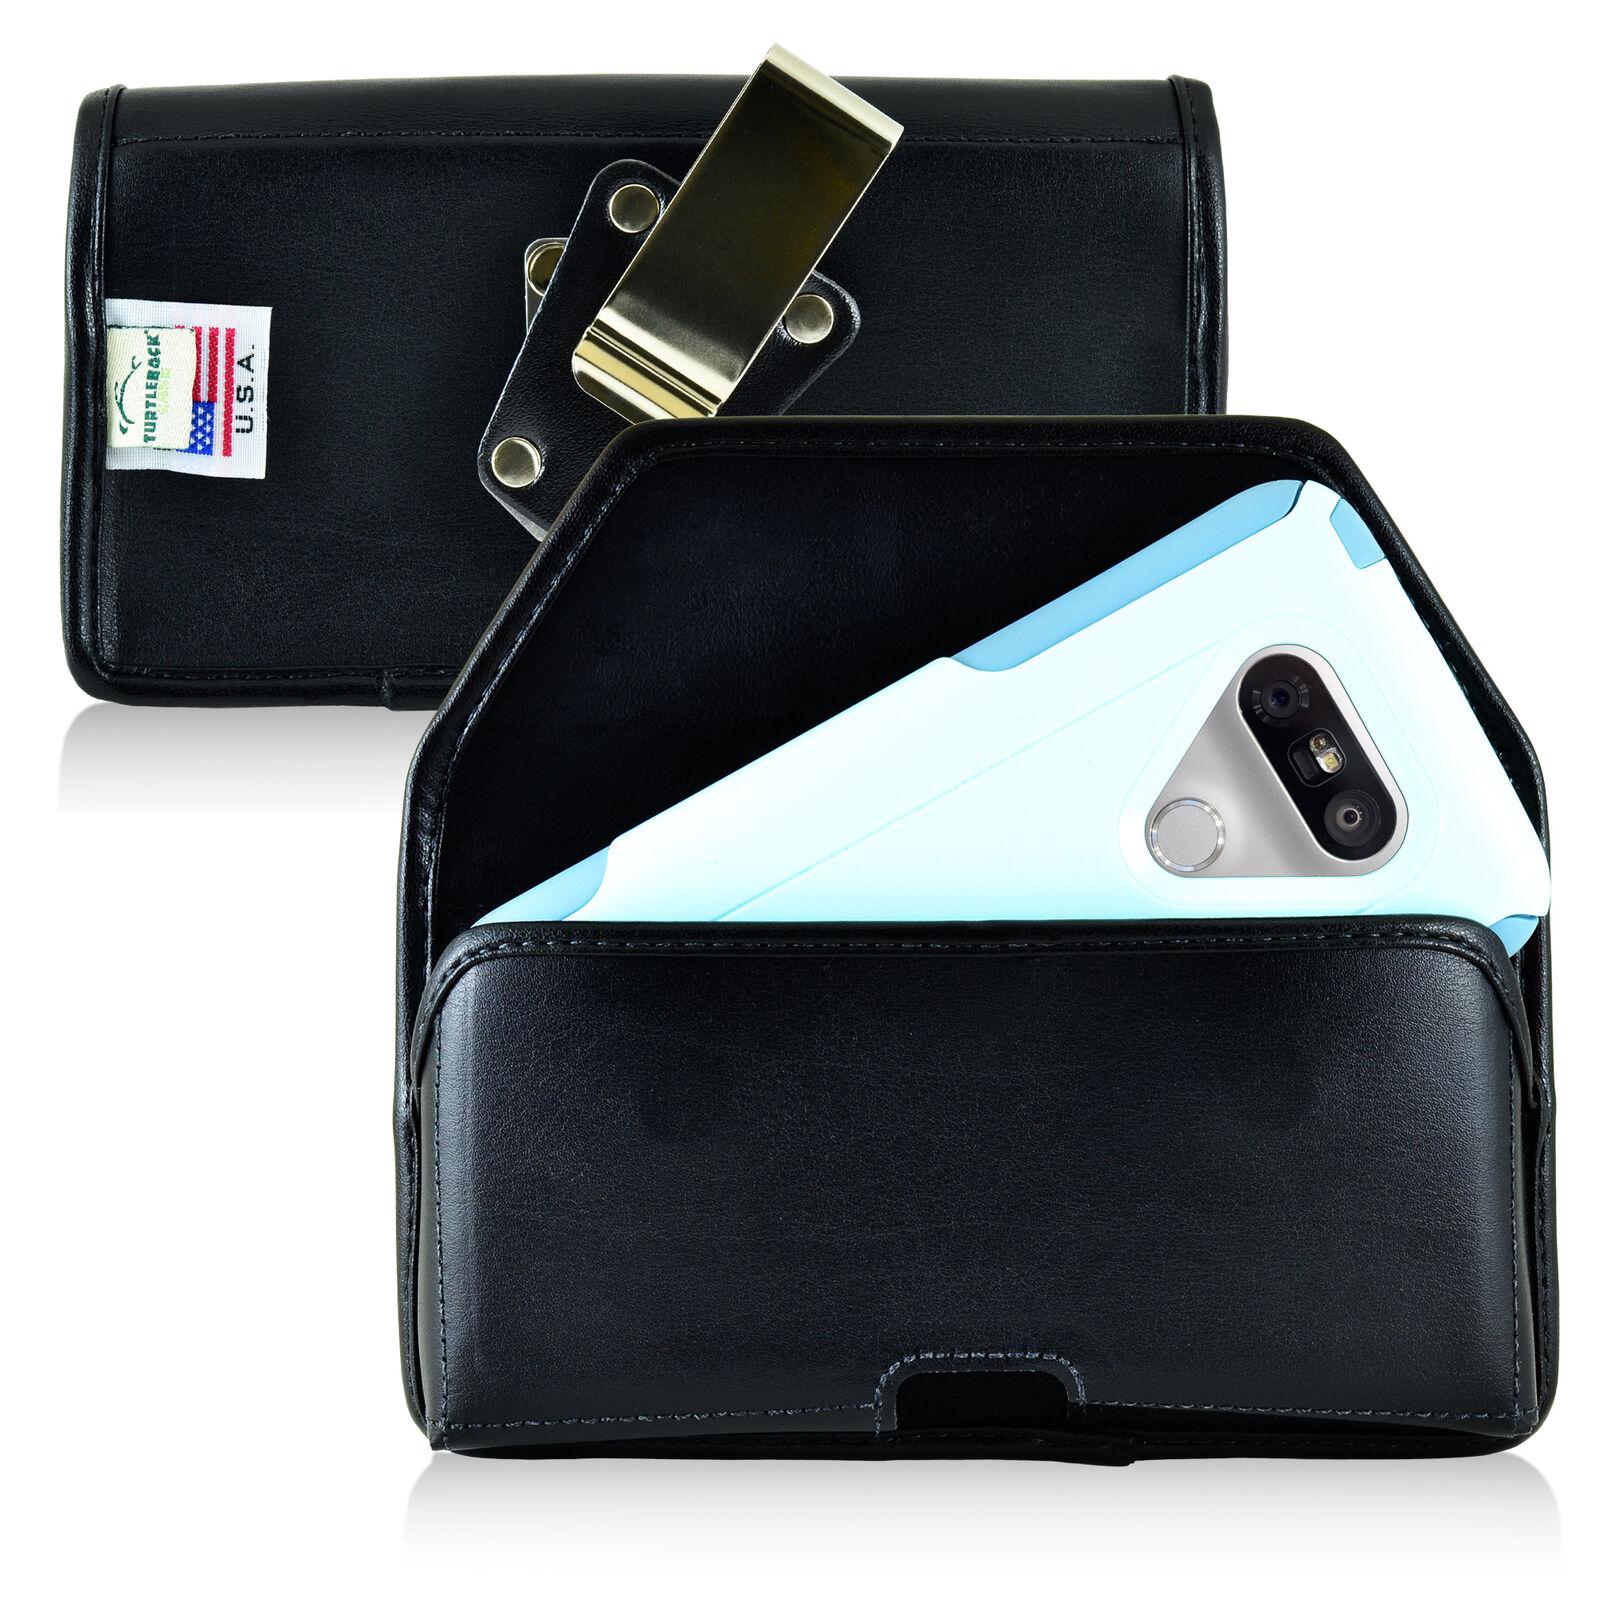 turtleback-lg-g5-leather-black-holster-case-metal-clip-fits-otterbox-commuter